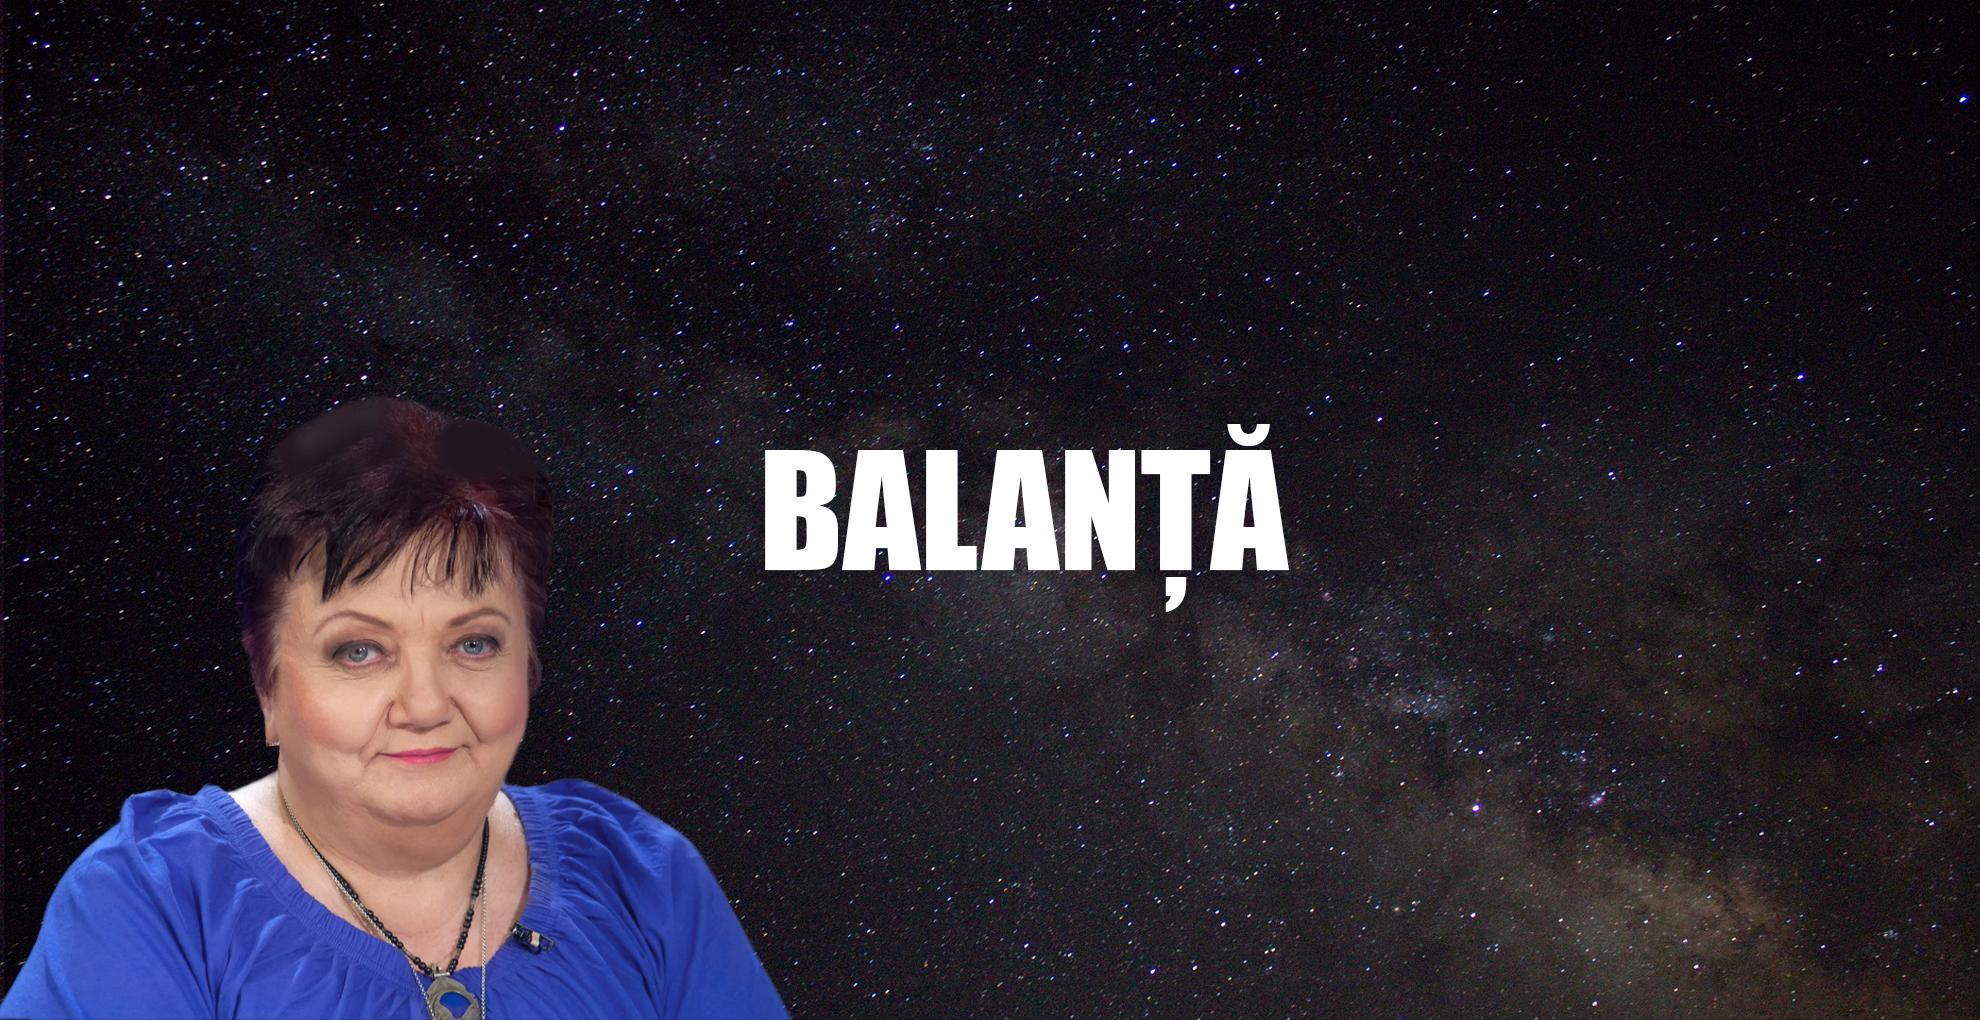 Horoscop Minerva iunie 2021 - Balanță